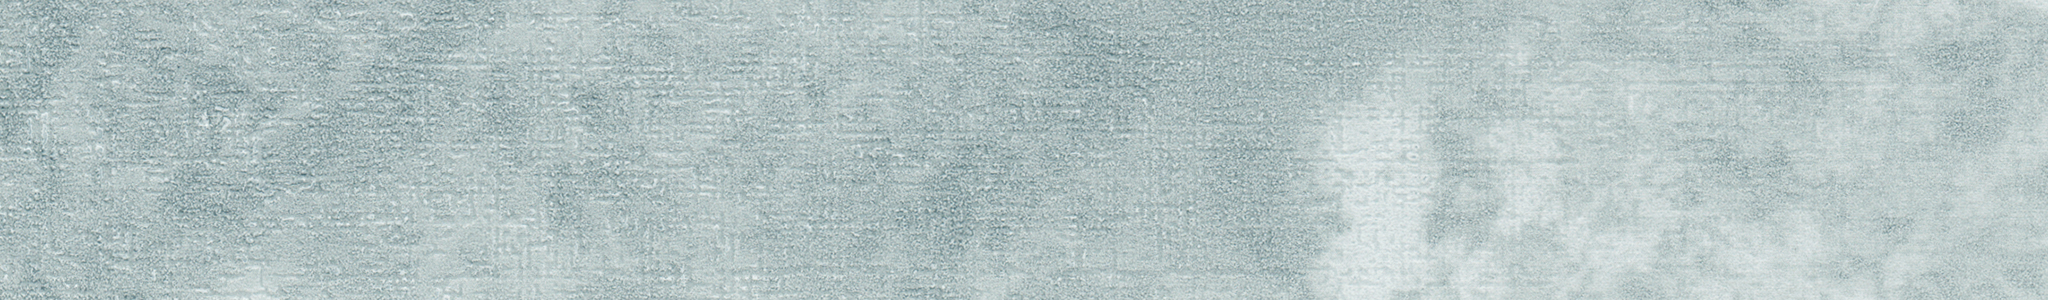 HD 296066 ABS Edge Blue Stucco Pore